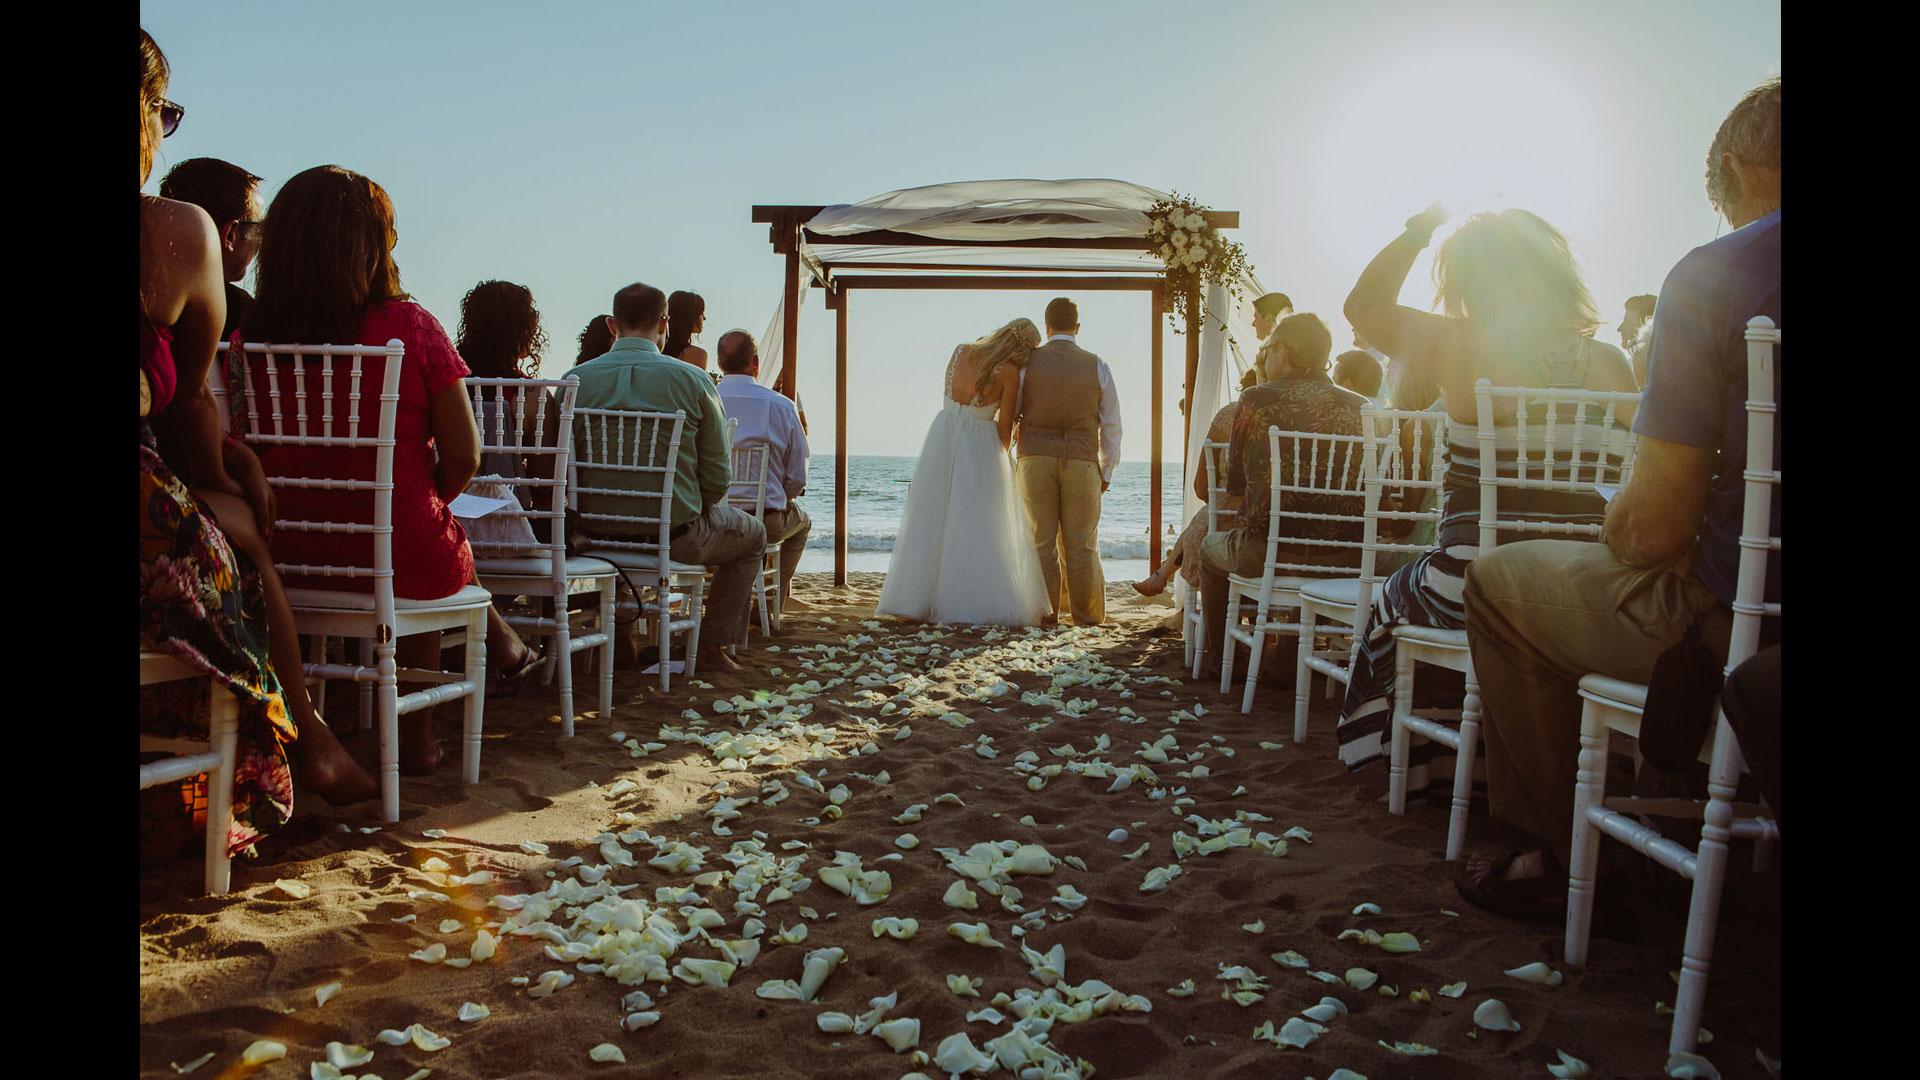 Weddings | Photographer: Raul Perez AmezquitaCurator: Bryan Esler